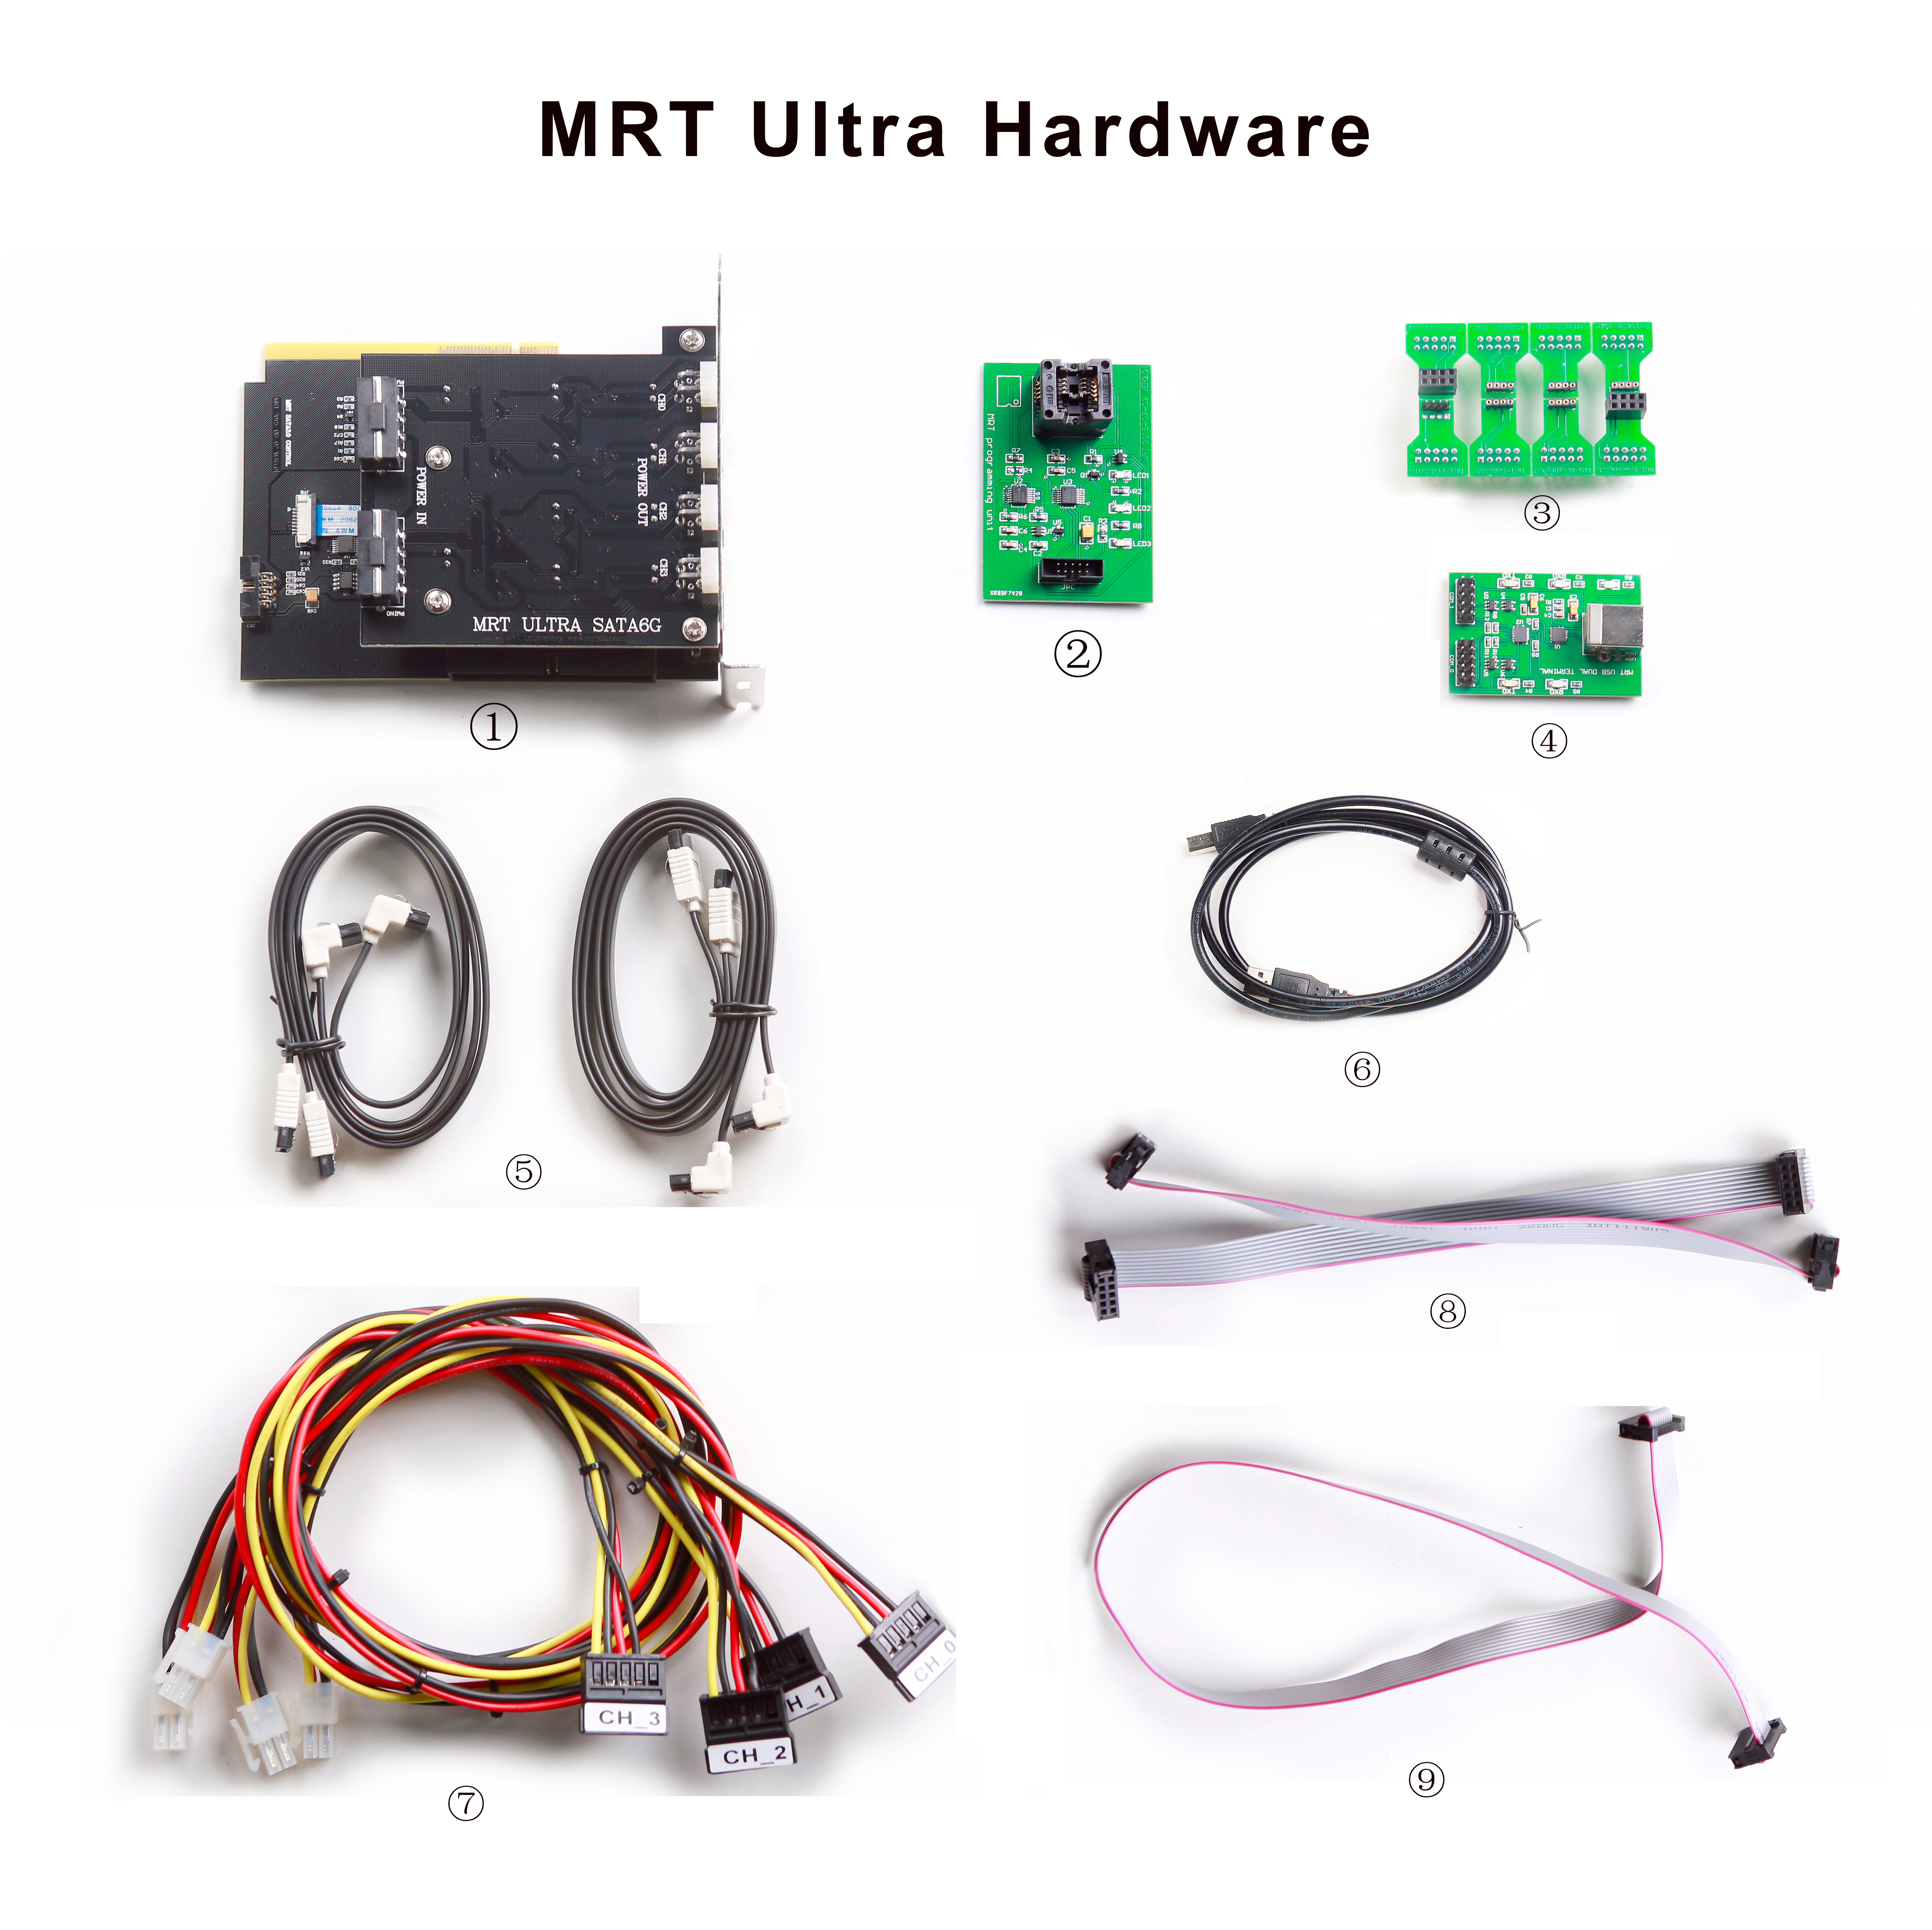 MRT Ultra Hardware